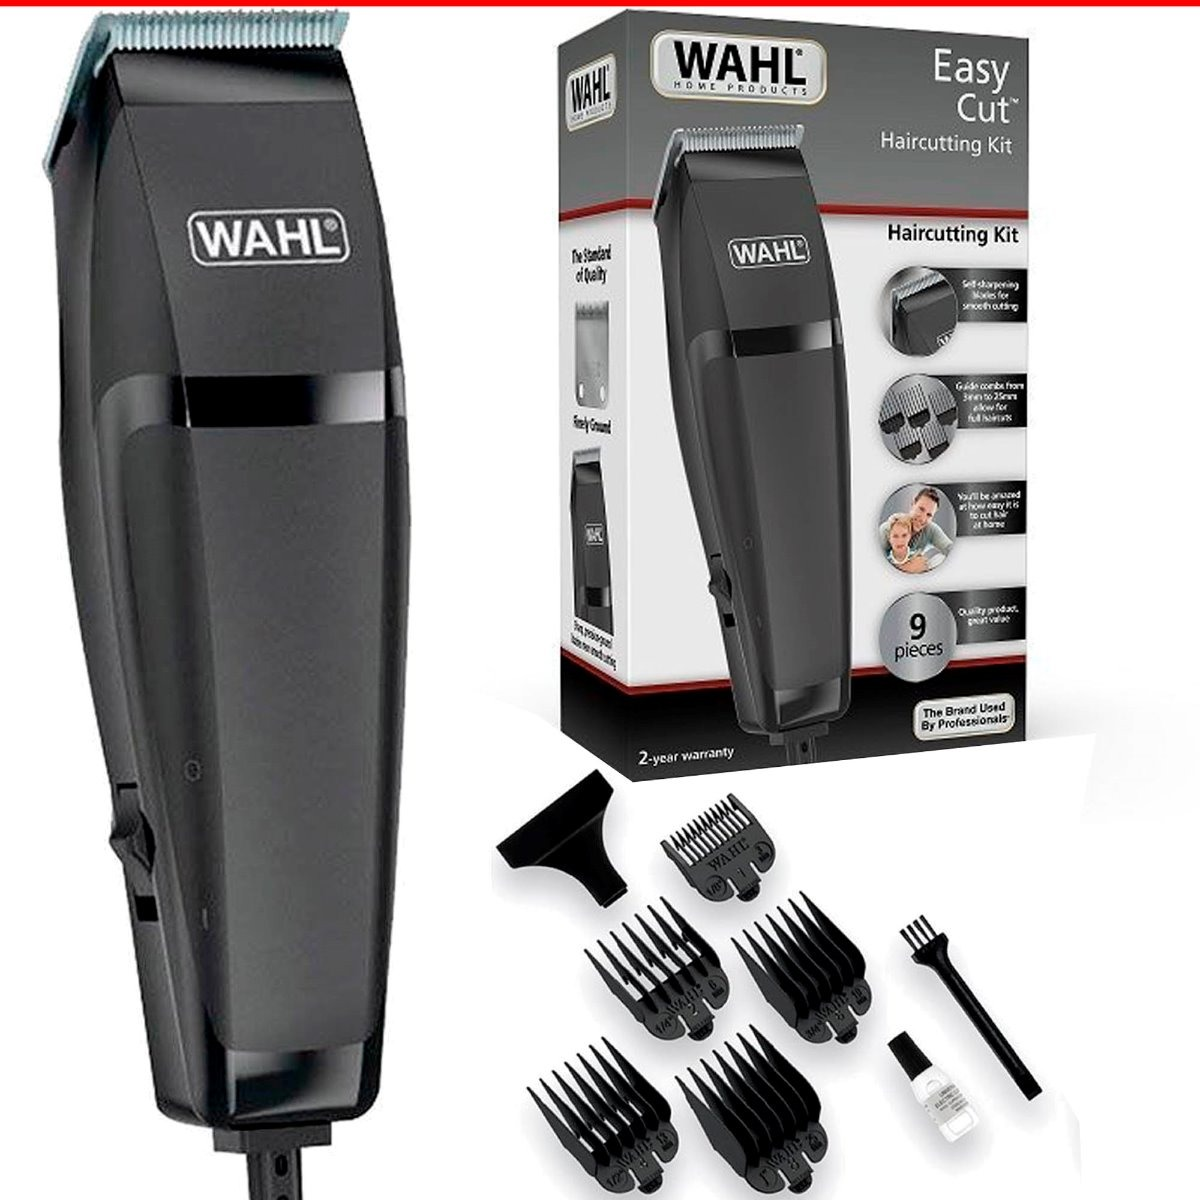 066f8e514 máquina cortar cabelo barba wahl clipper easy cut preto 220v. Carregando  zoom.